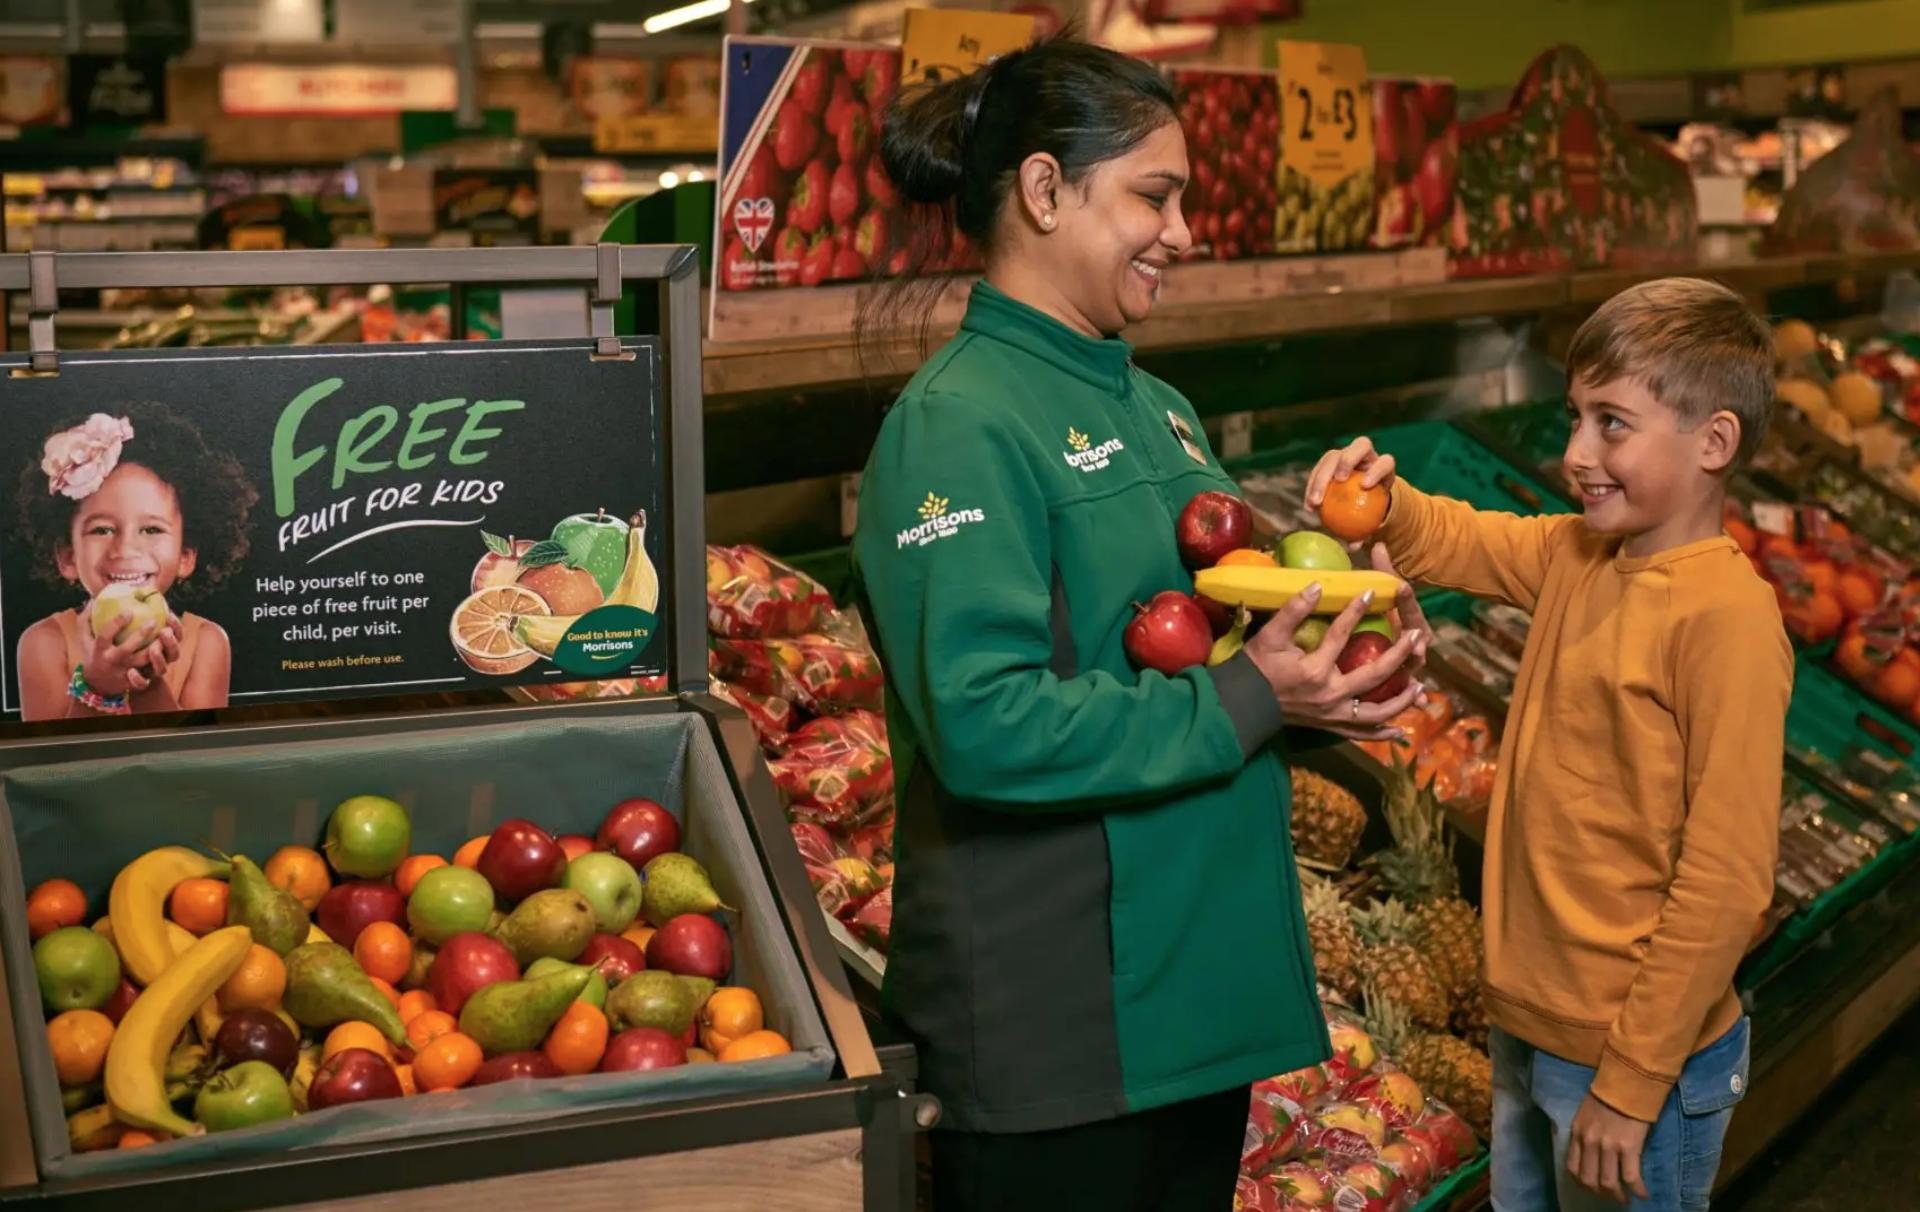 Morrisons free fruit scheme